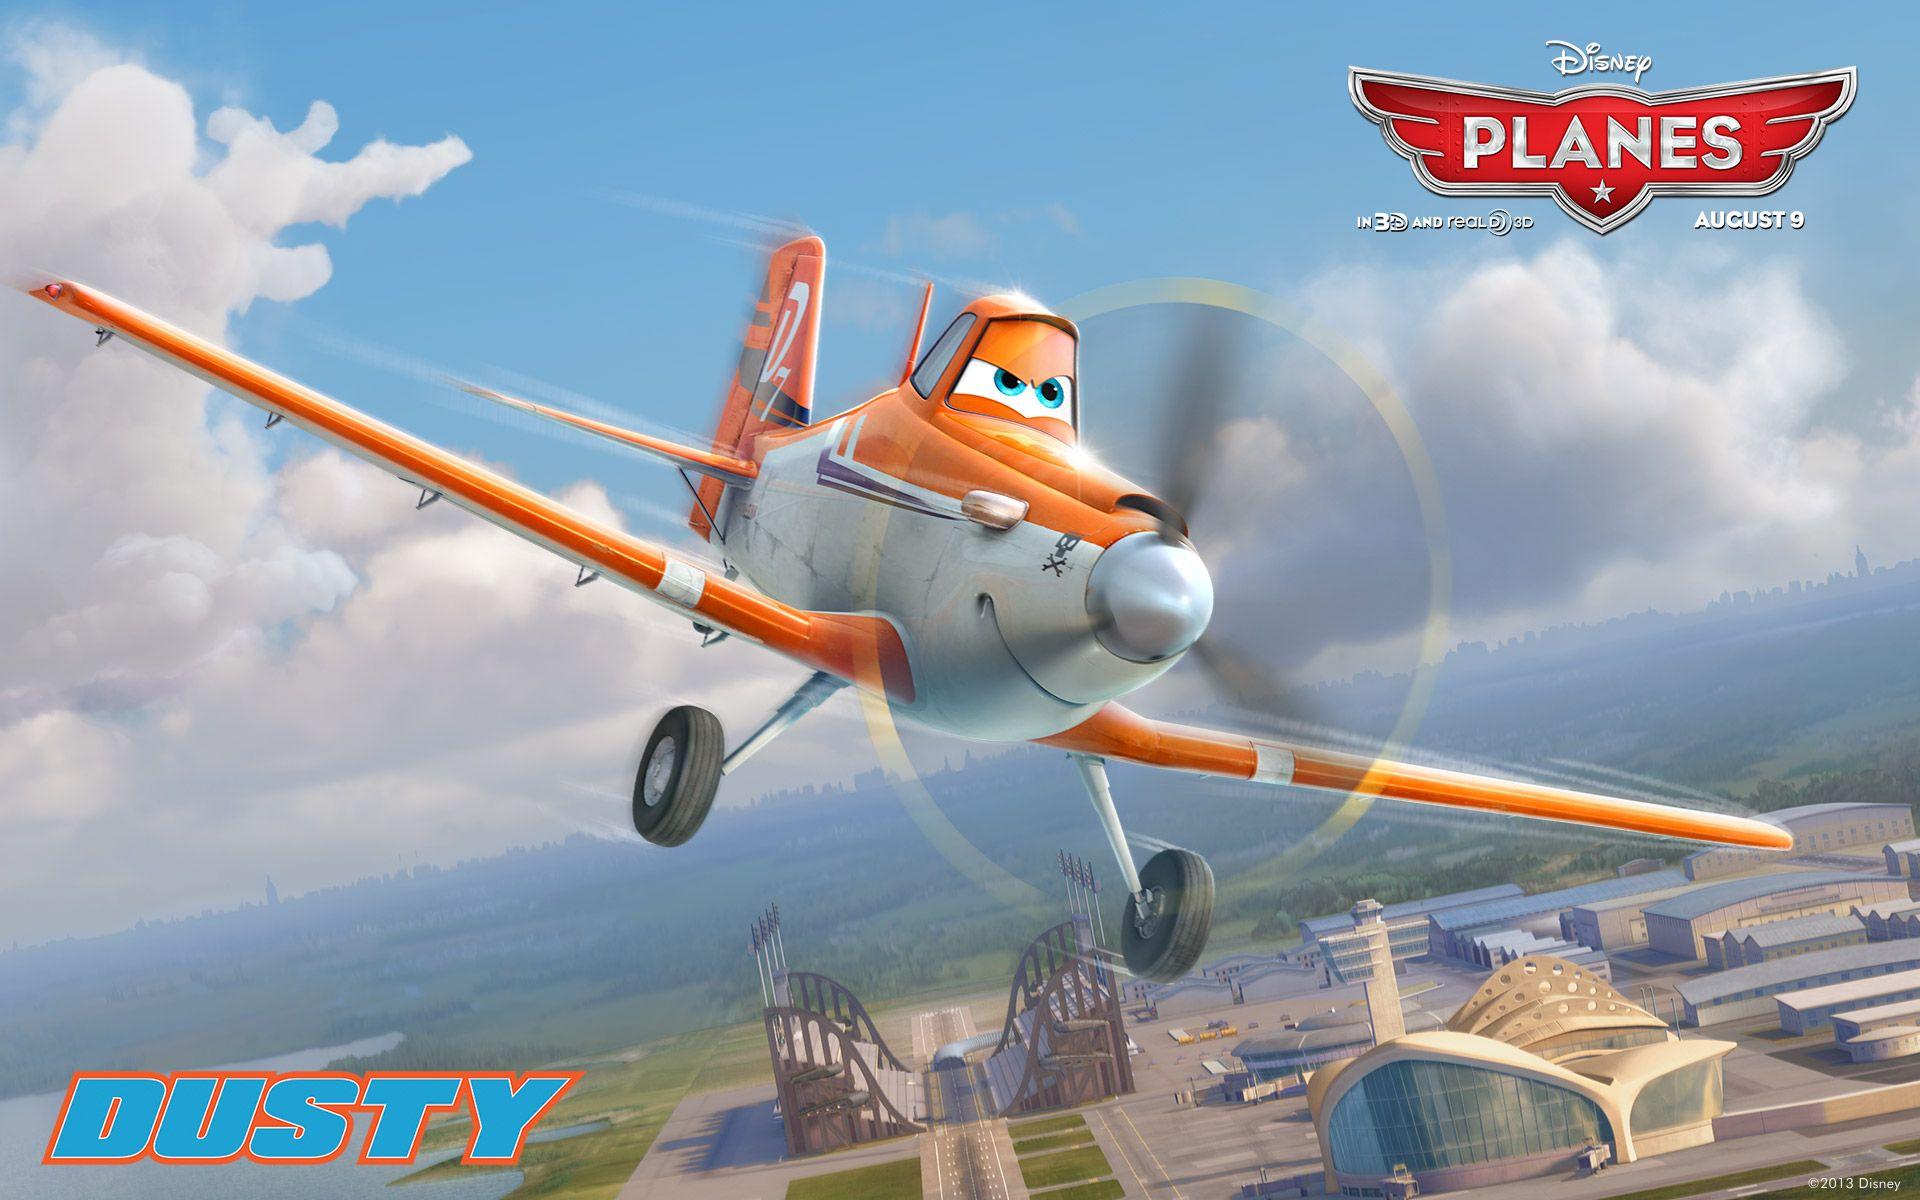 DISNEY PLANES DUSTY   Disney-Planes_Movie_Wallpaper_Dusty   Disney ...